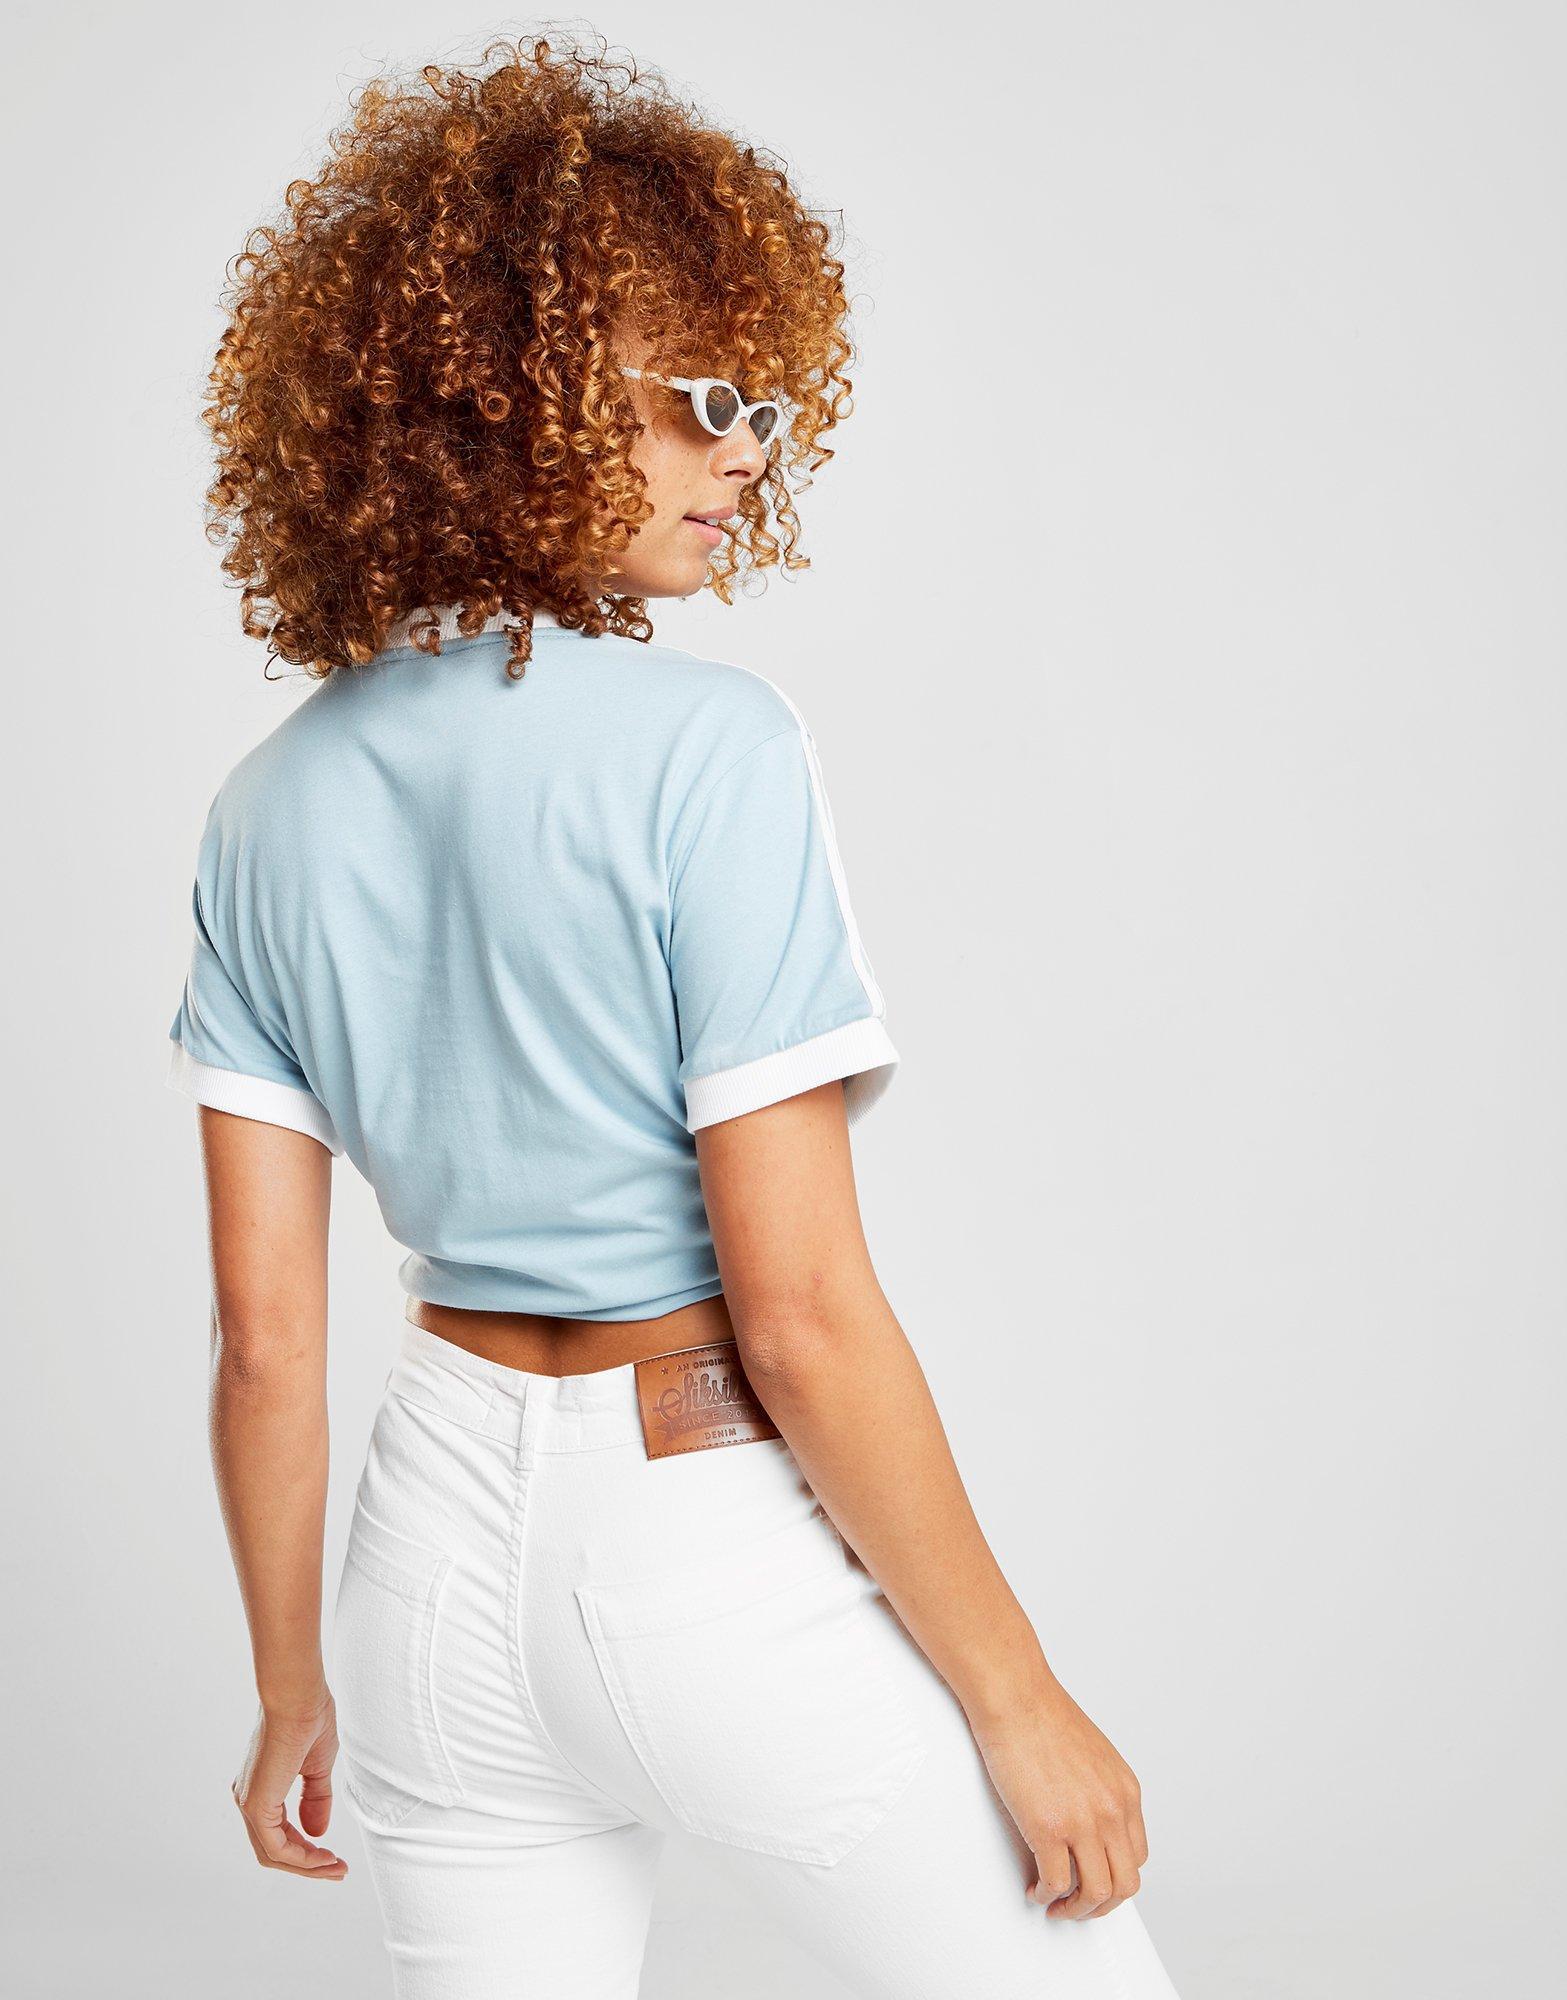 Lyst Adidas Originals 3 azul rayas camiseta de California rayas California en azul 3ecfc31 - colja.host